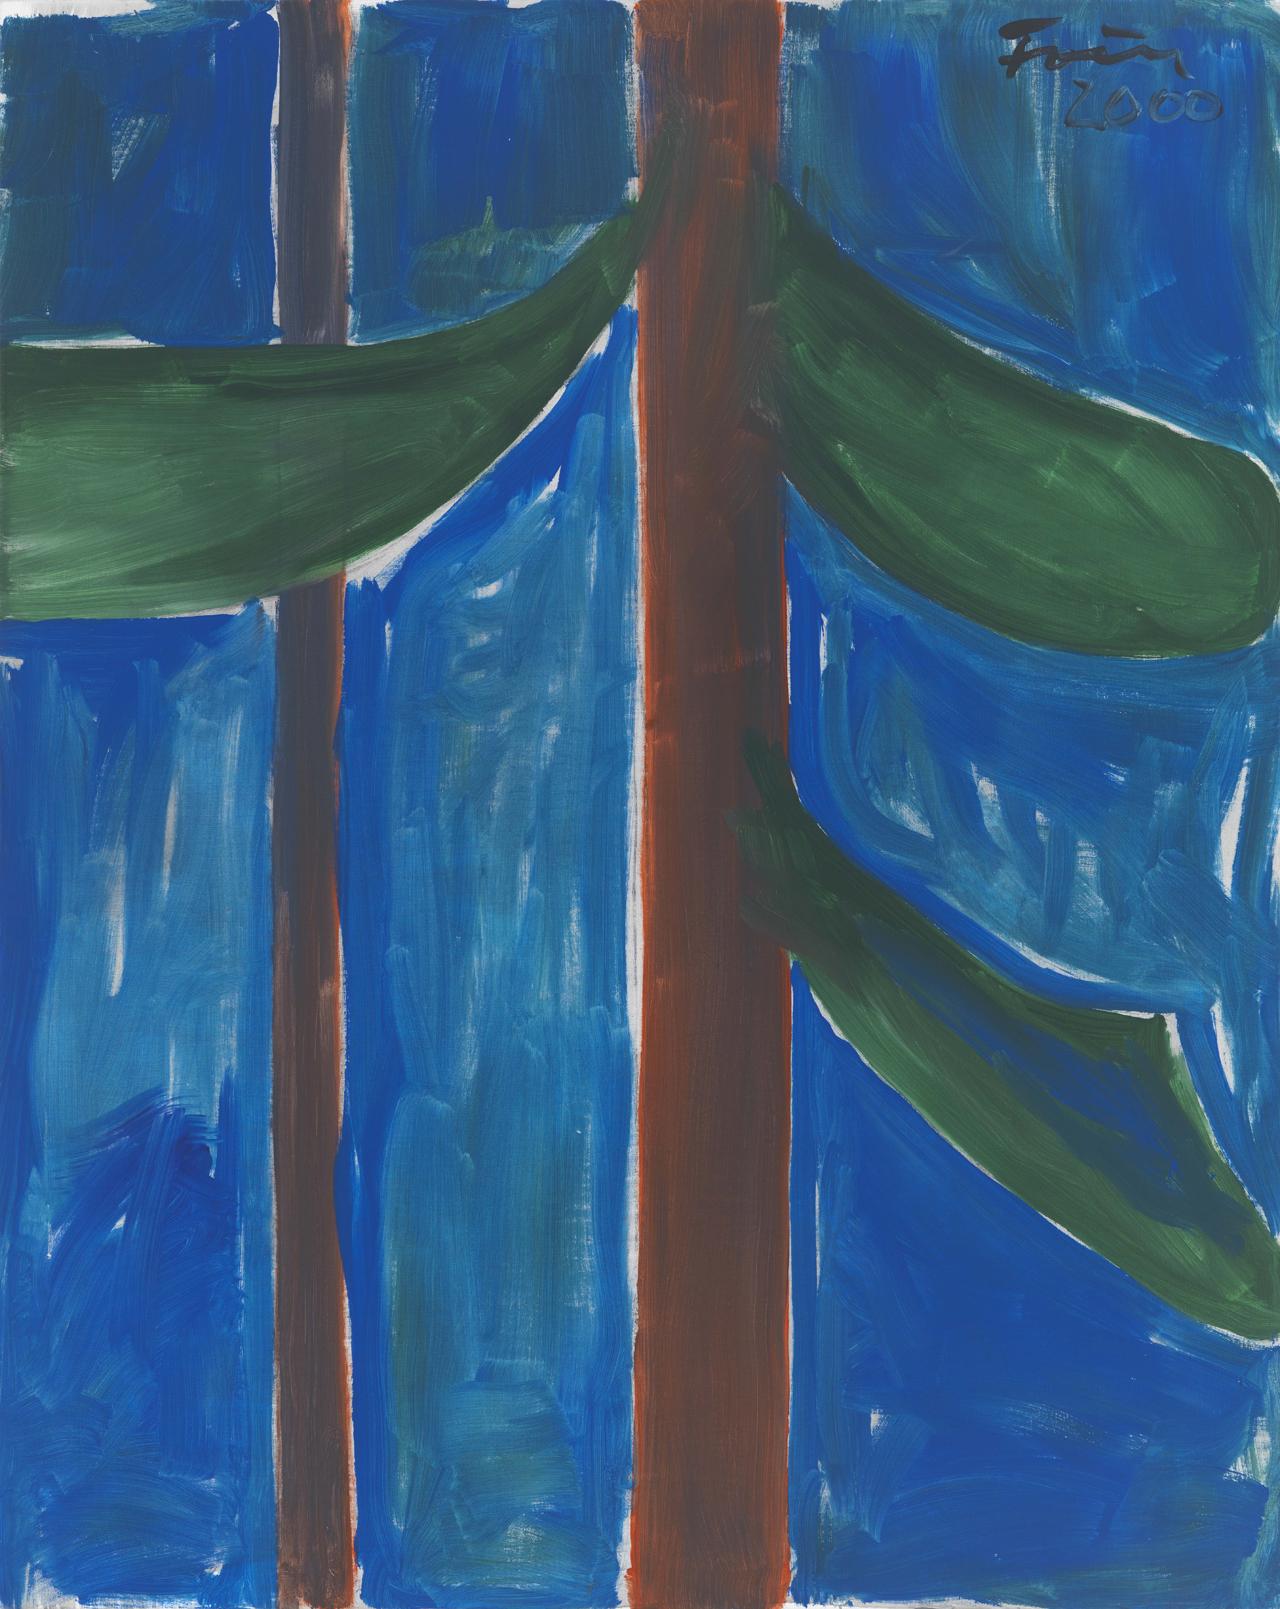 Günther Förg, Ohne Titel, 2000, Acryl auf Leinwand, 151 x 120,5 cm